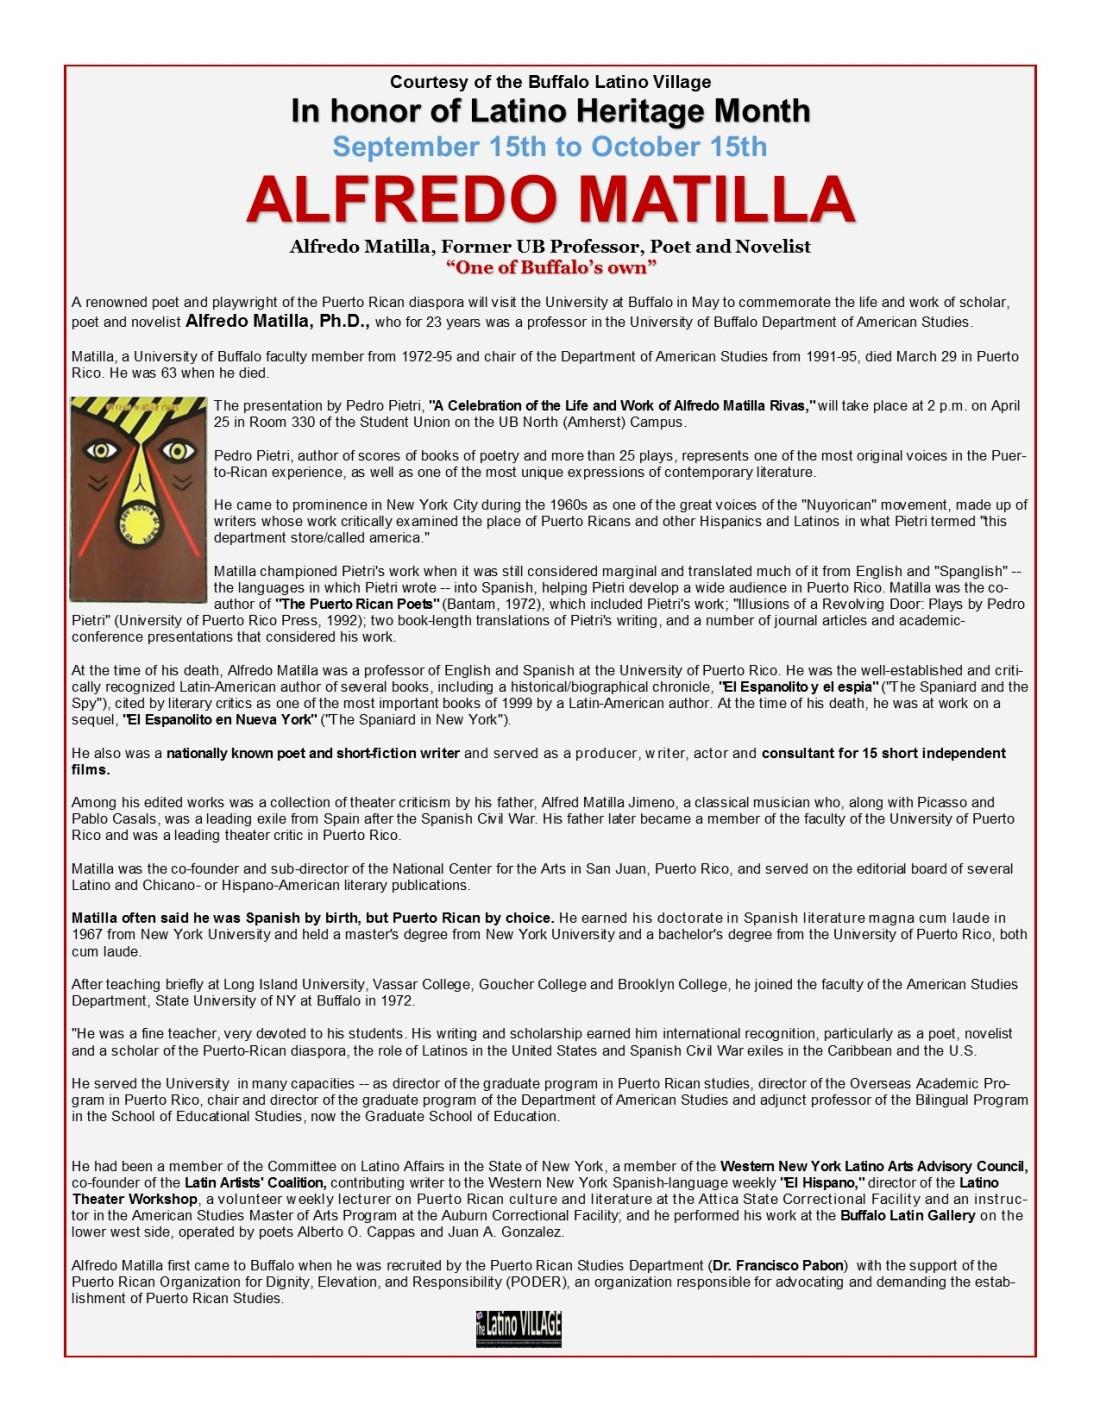 Alfredo Matilla